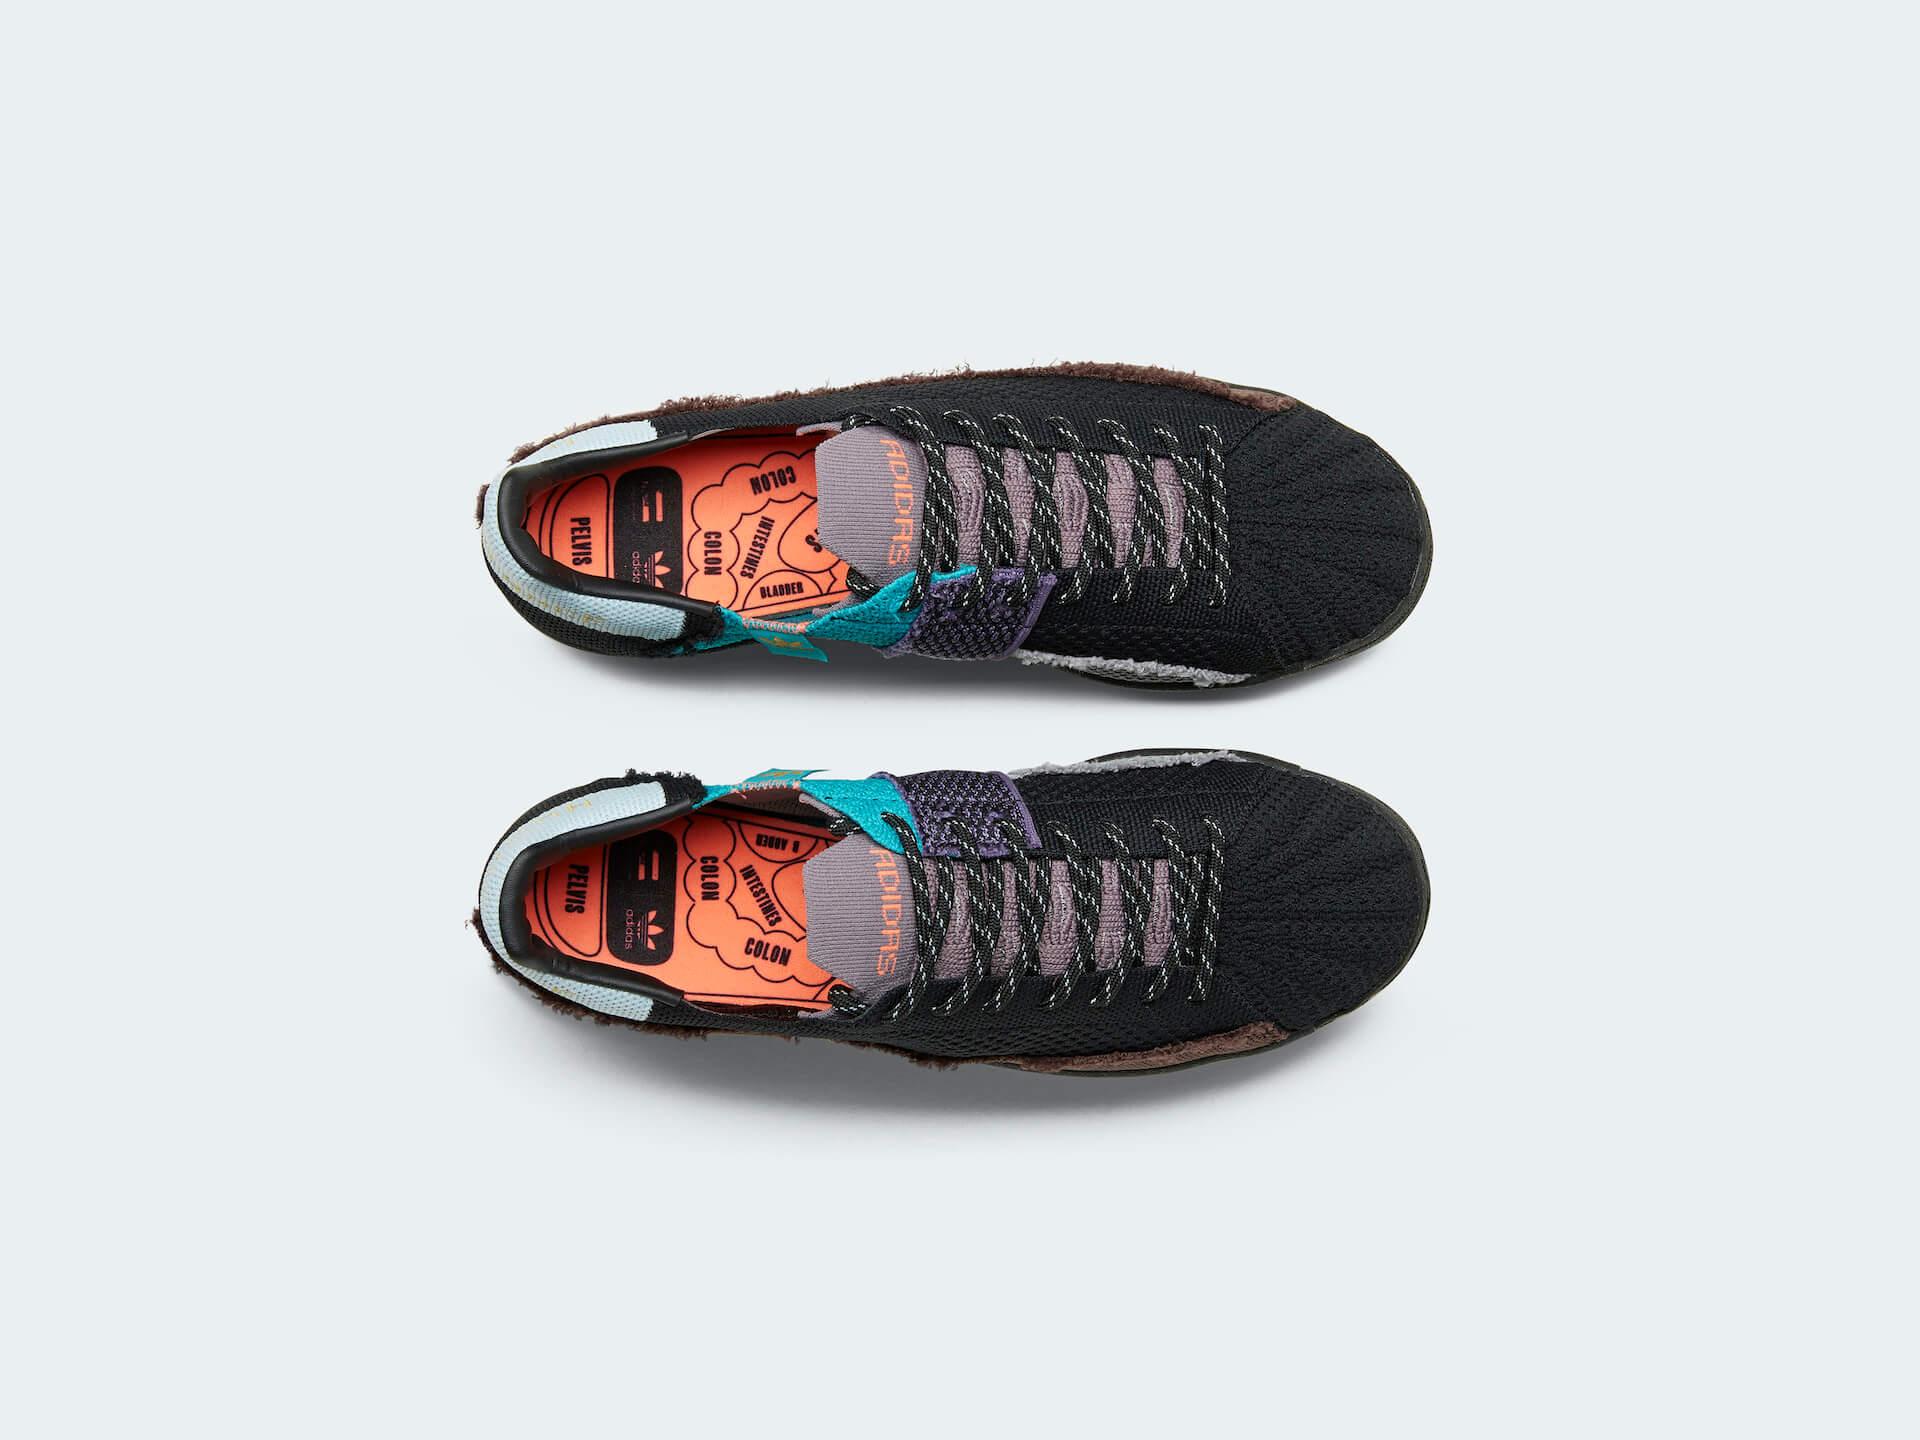 adidas Originalsとファレル・ウィリアムスのコラボ『SUPERSTAR』が登場!パッチワークパネルが目を引くデザイン lf200701_adidasporiginals_pharrelwilliams_10